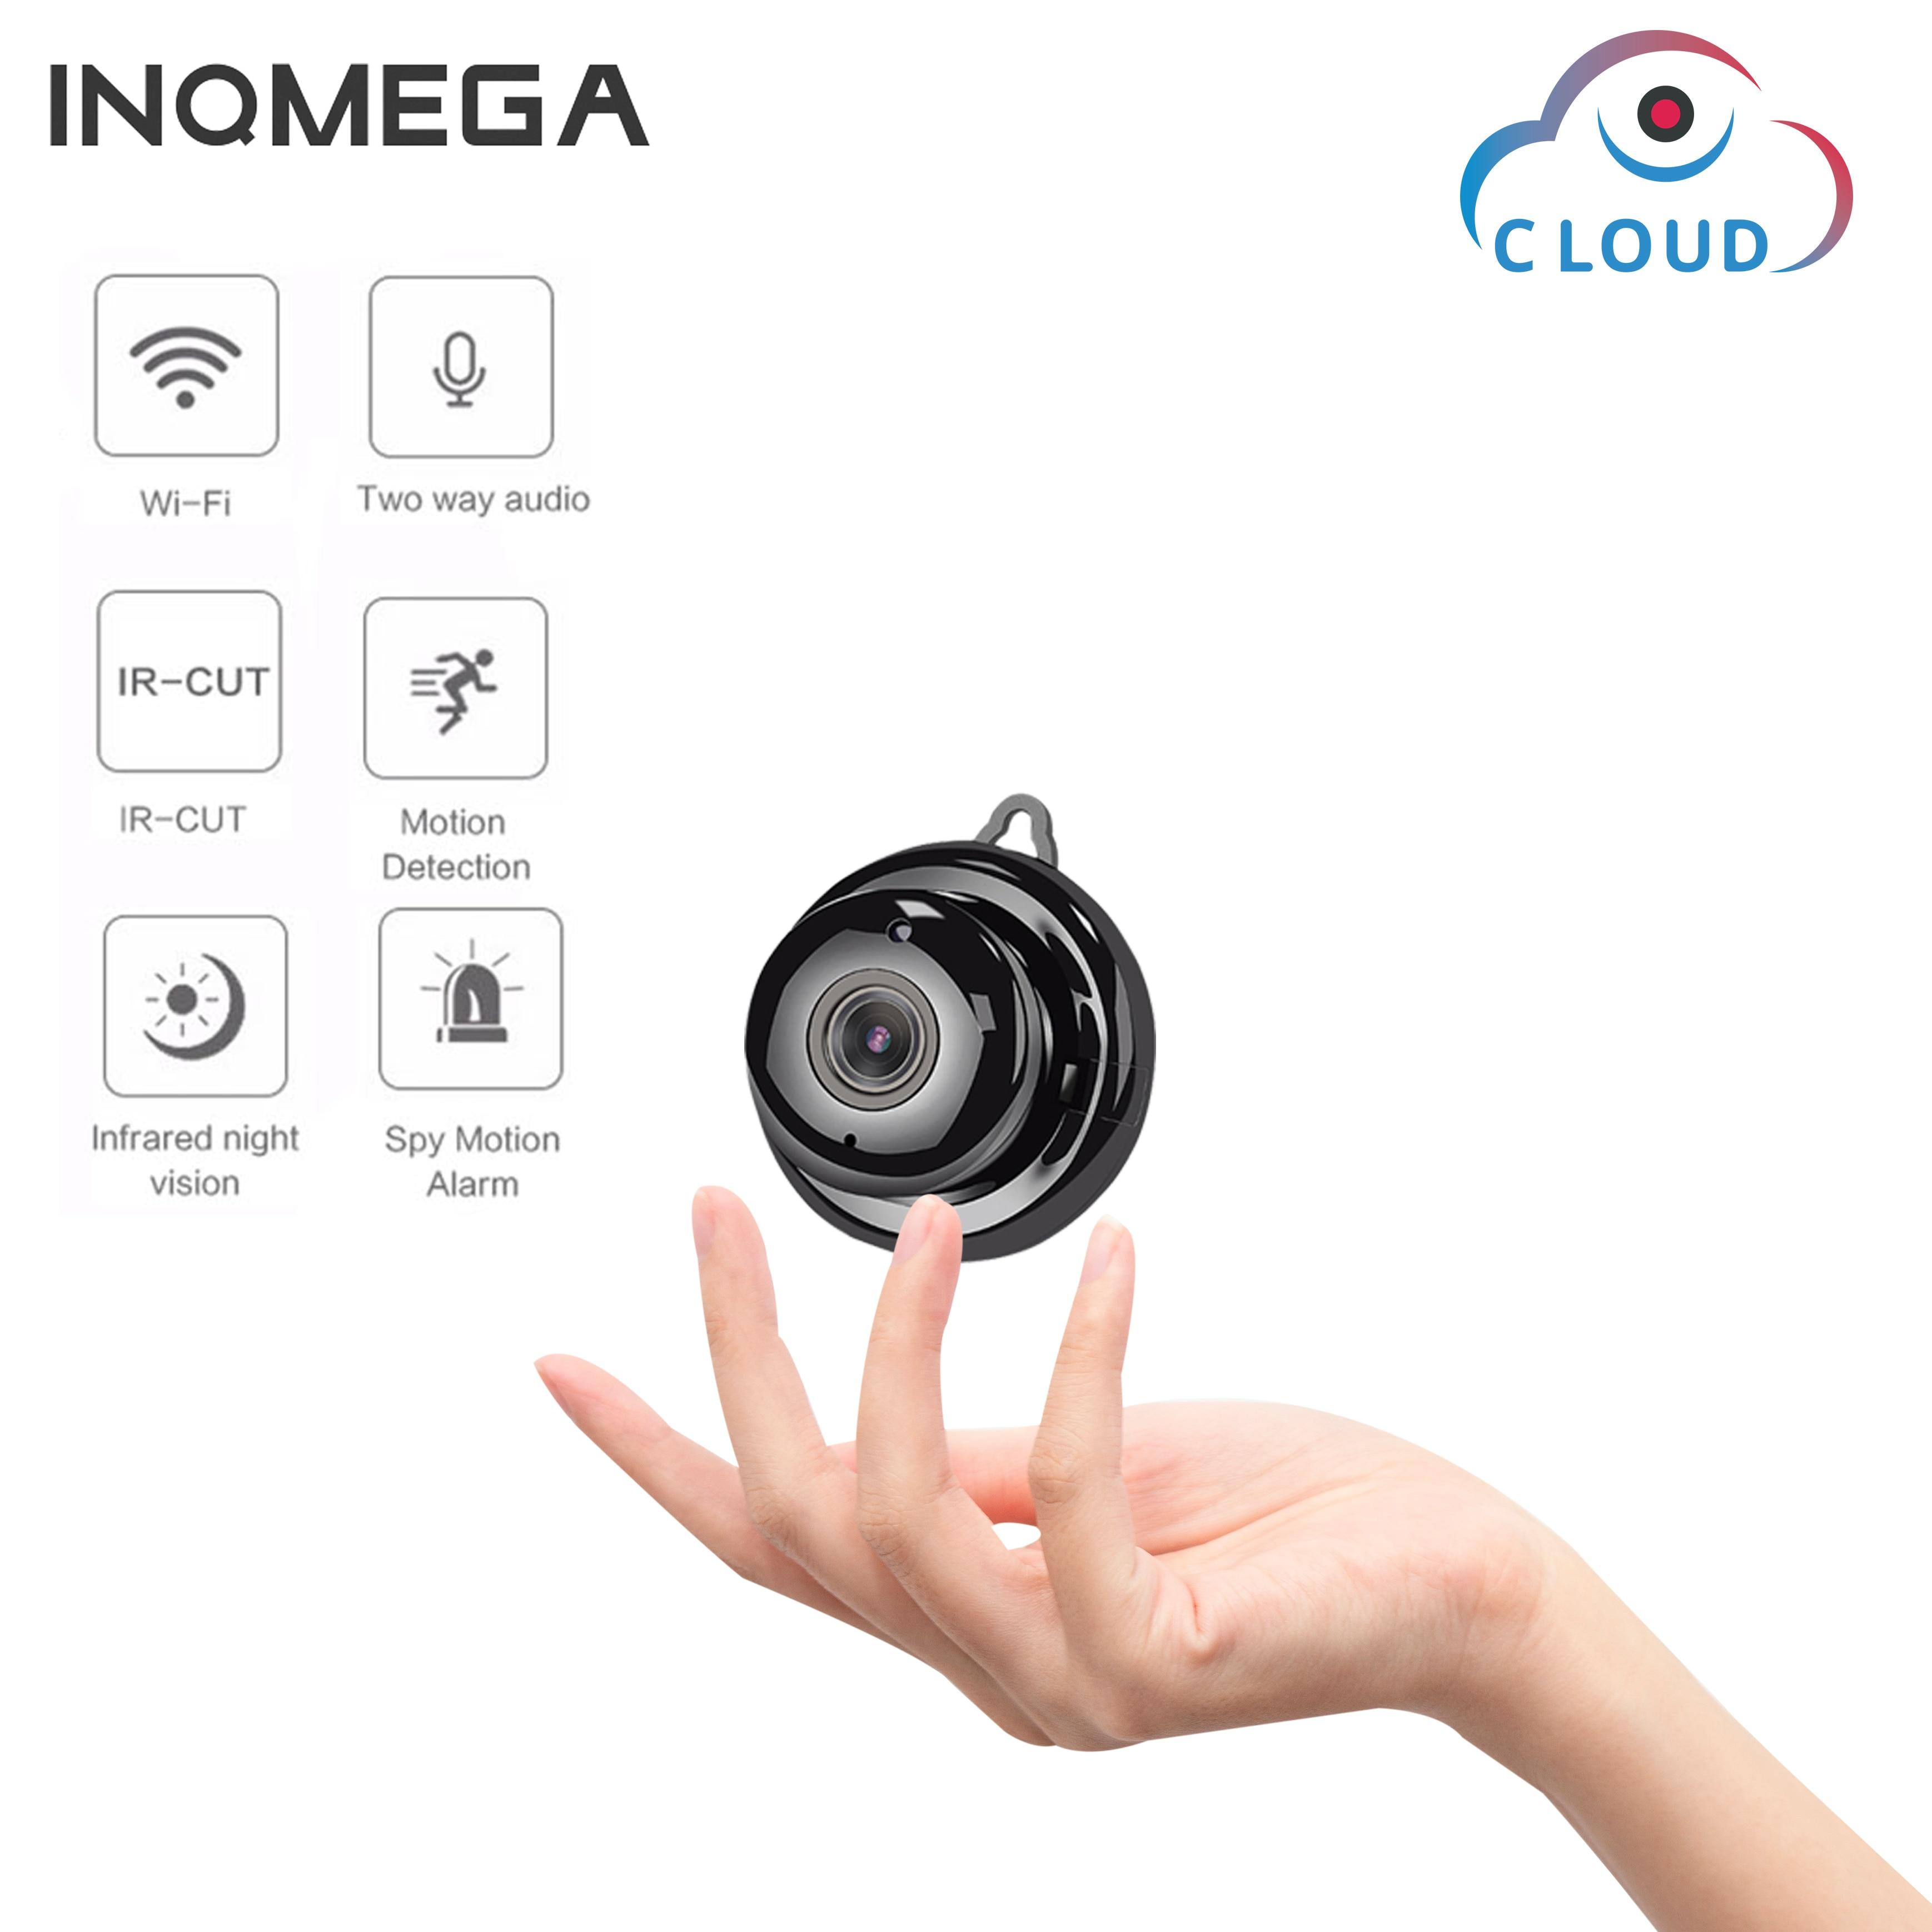 INQMEGA 1080P Wireless Mini WiFi Camera Home Security Camera IP CCTV Surveillance IR Night Vision Motion Detect Baby Monitor P2P